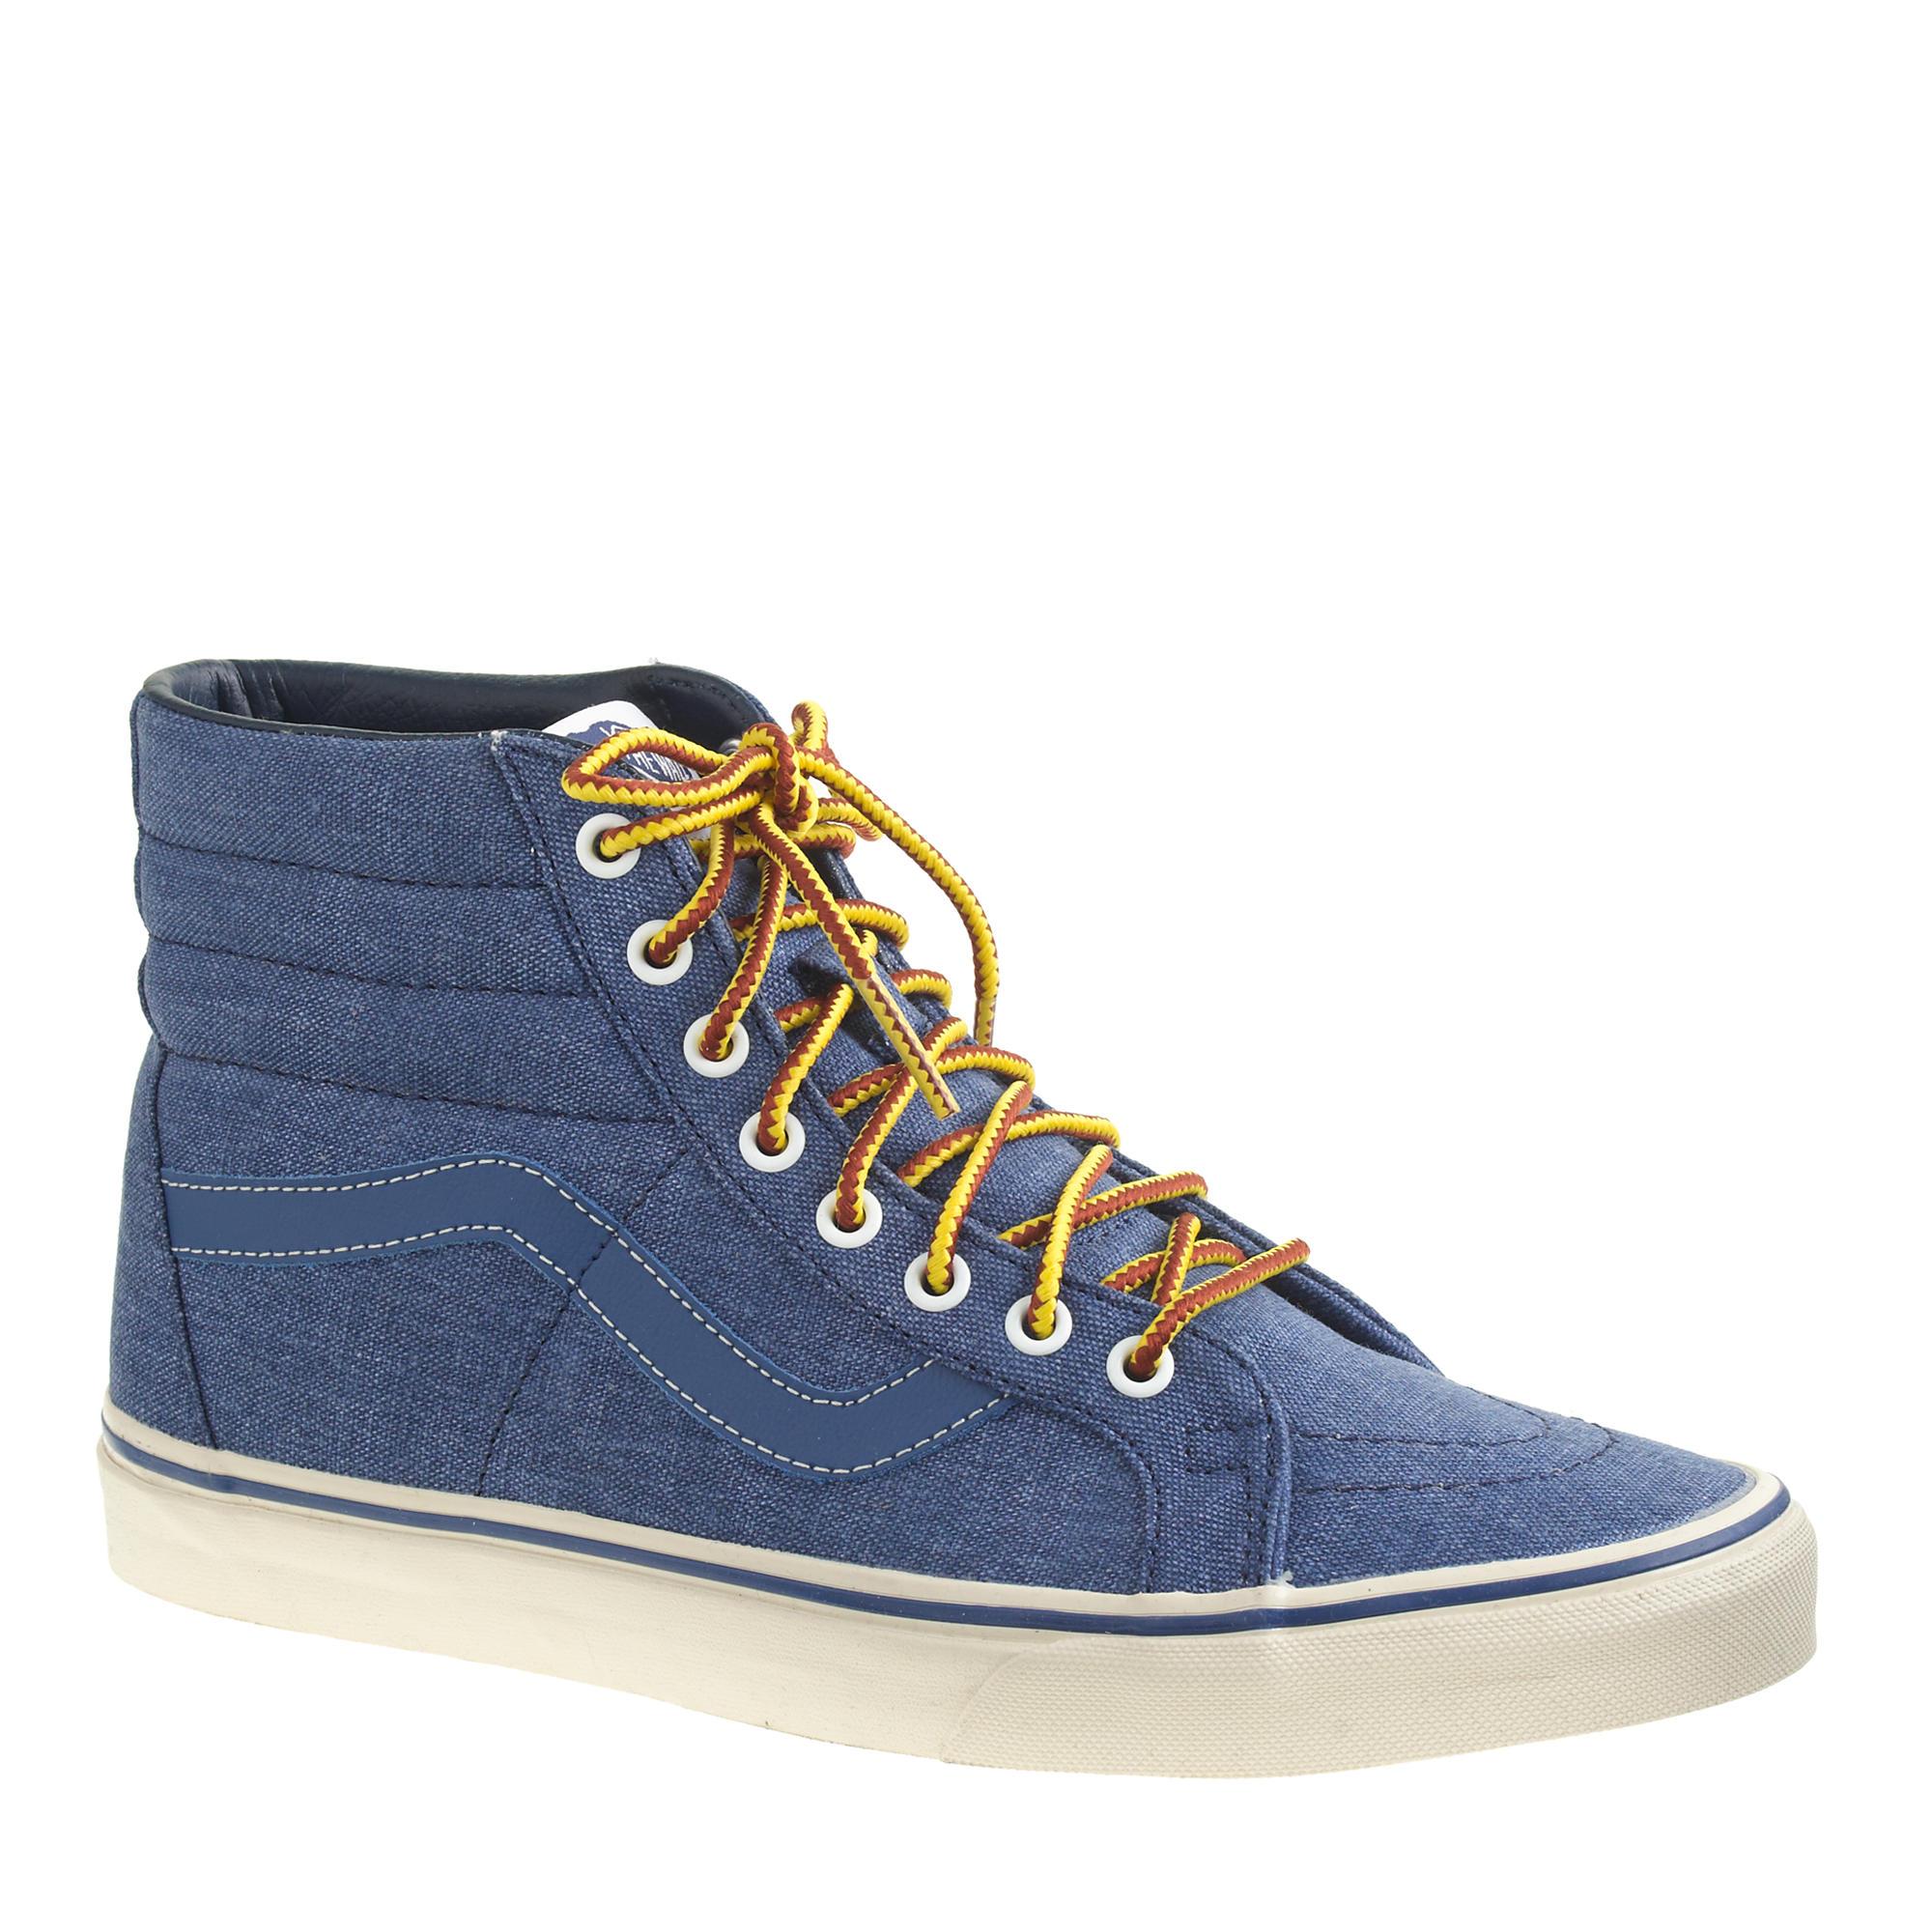 8b6e6c3de0e5b1 Lyst - J.Crew Men s Vans Sk8-hi Reissue Sneakers in Blue for Men